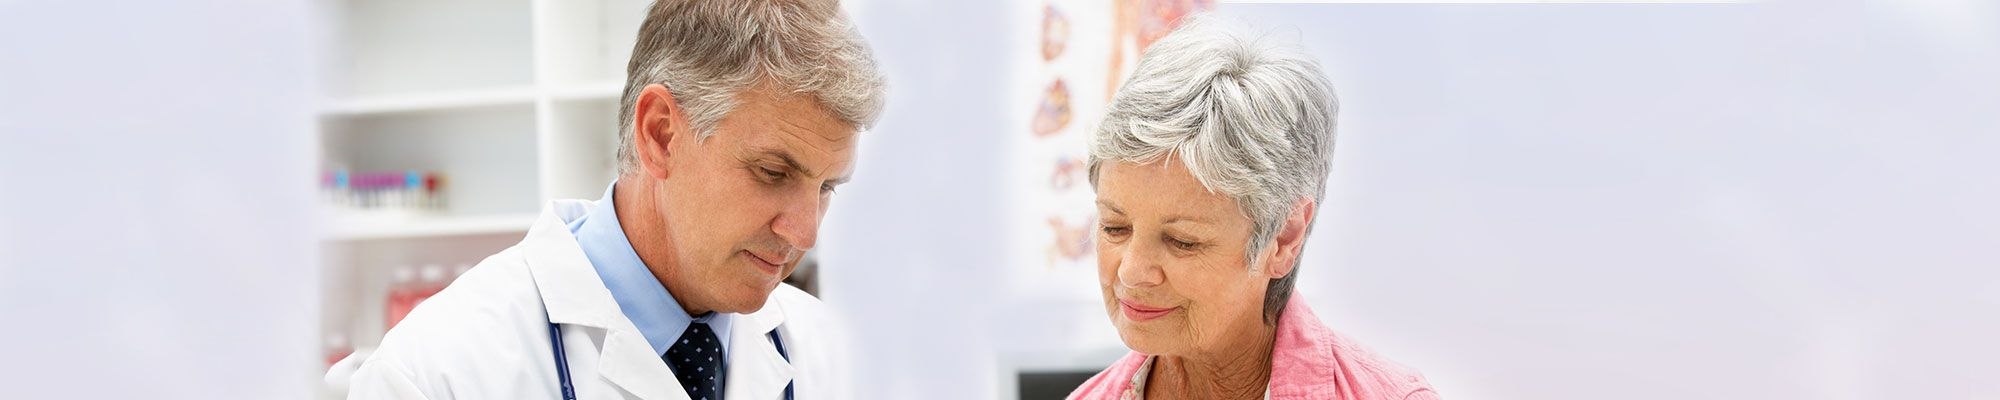 Select Clinics for ERChealth Companies in Ohio